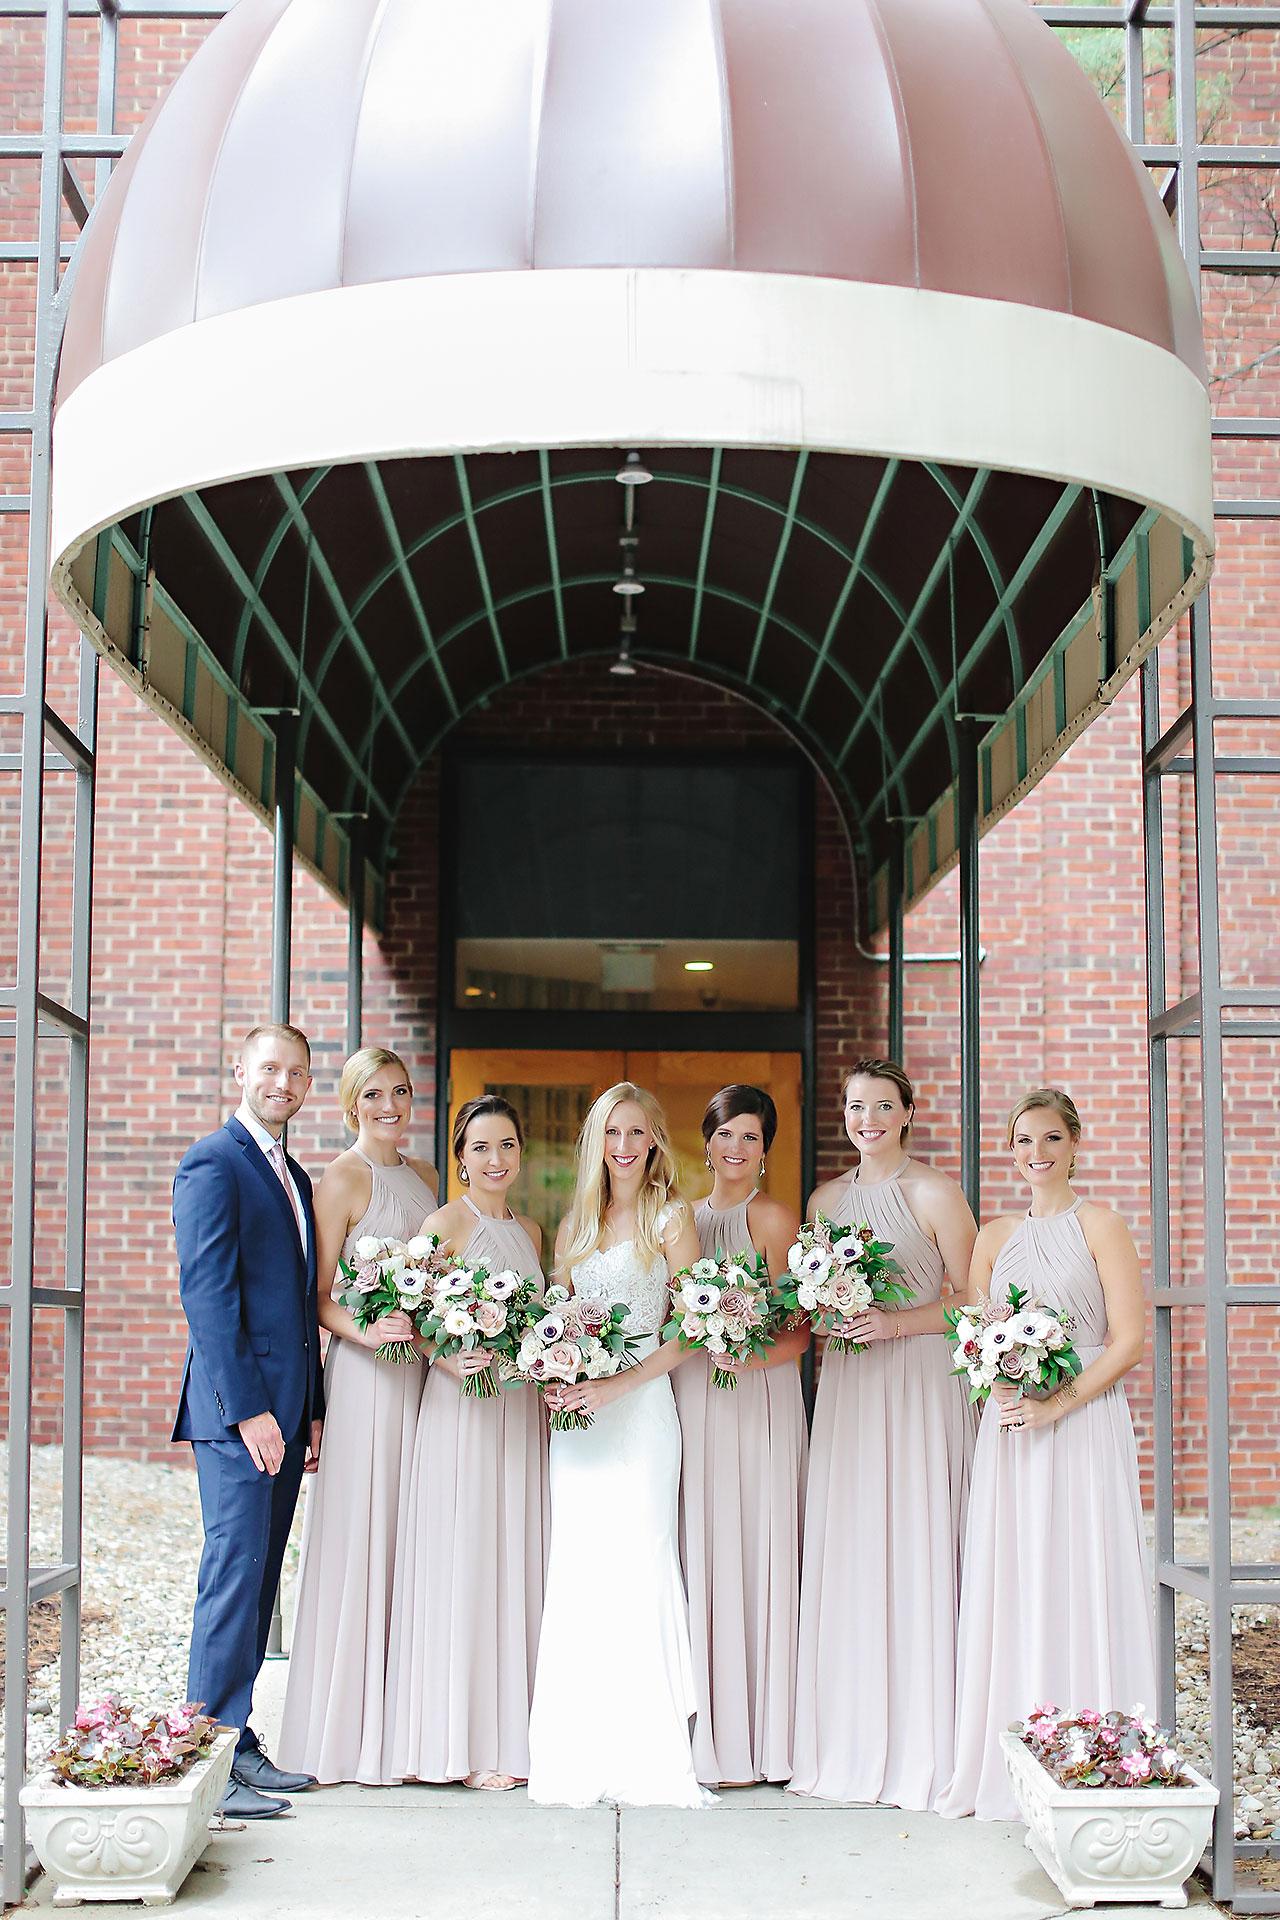 Molly Declan Scottish Rite Indianapolis Wedding 043